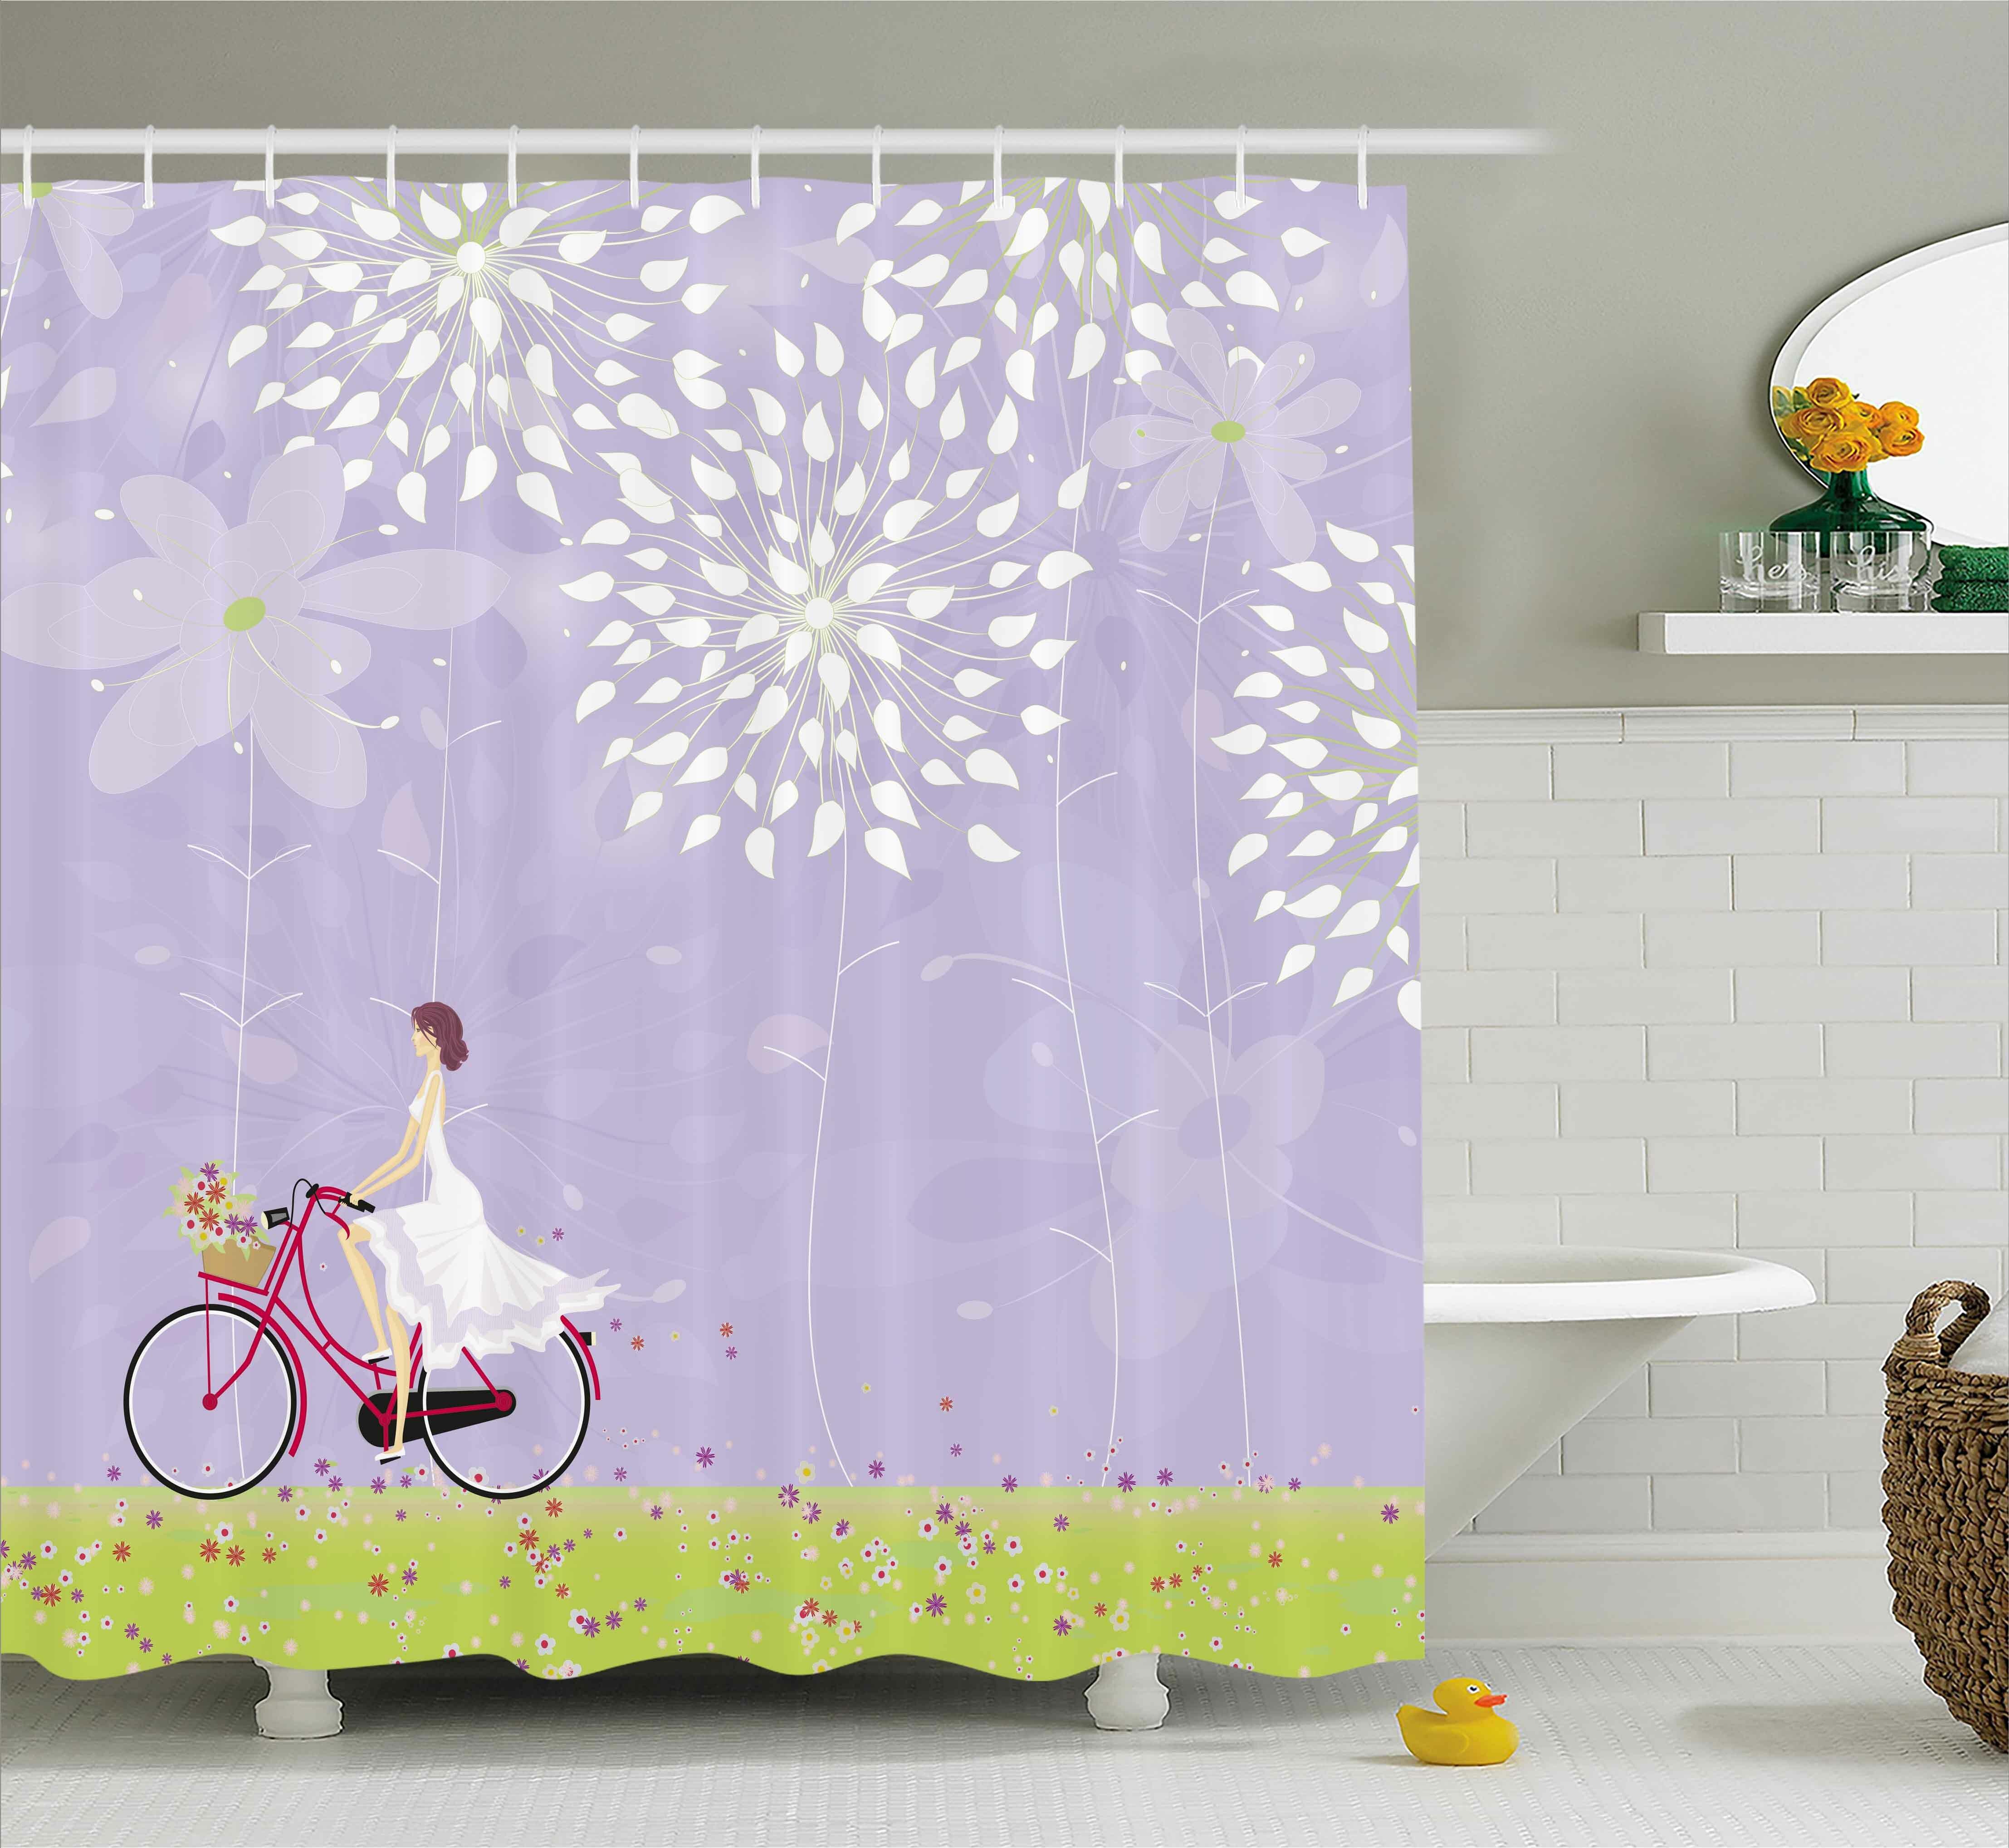 East Urban Home Girl Riding Bike Shower Curtain